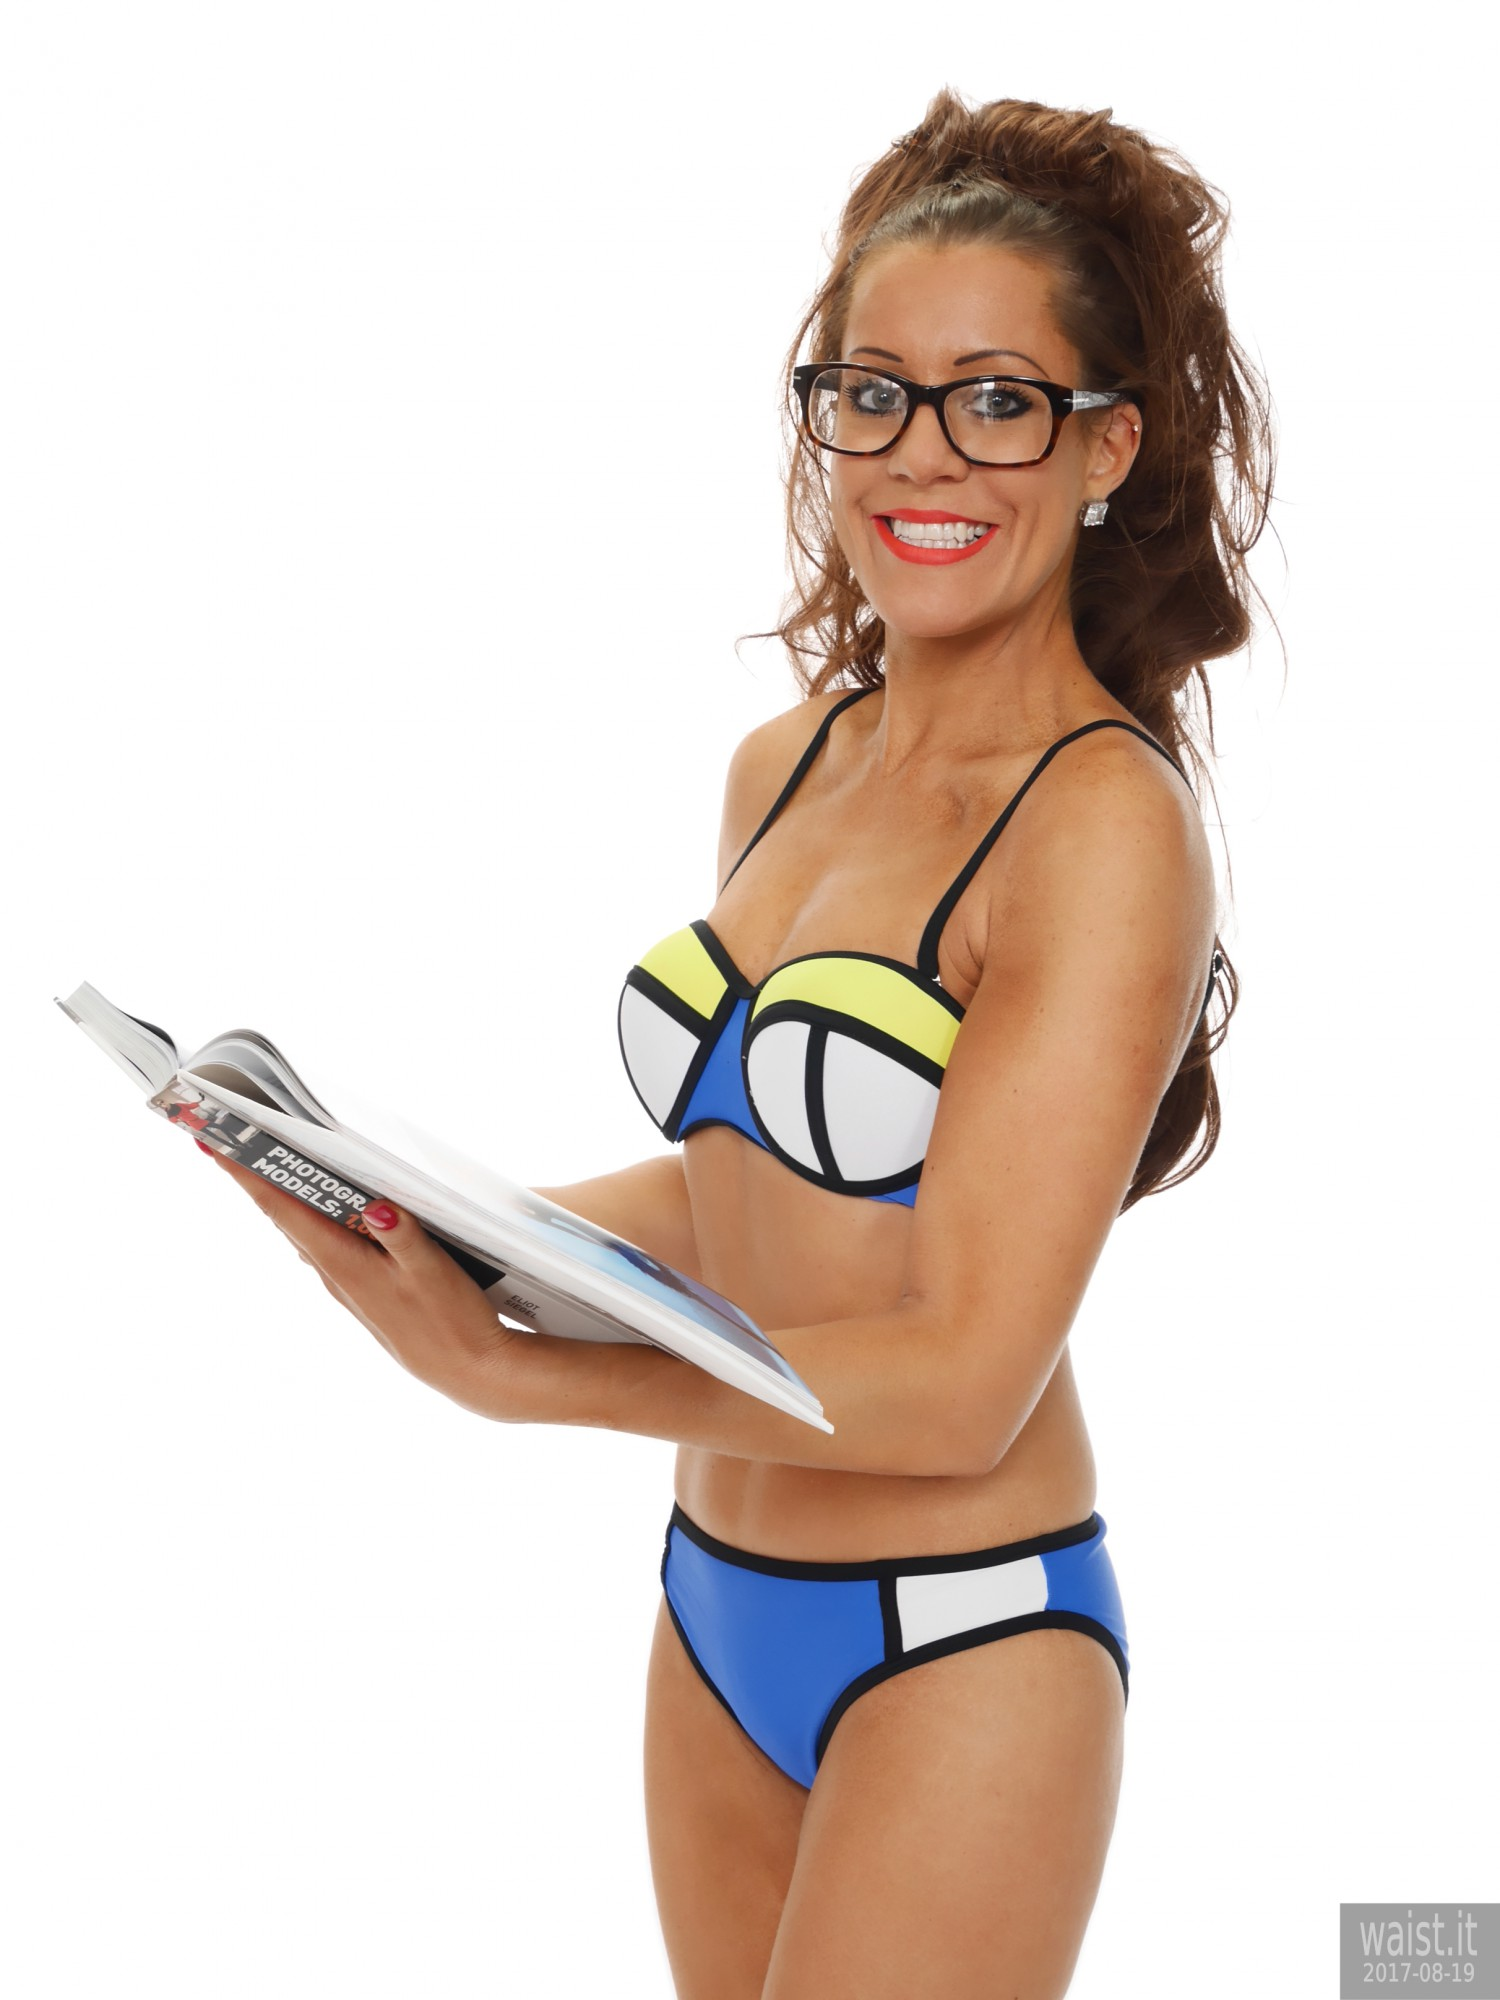 2017-08-19 Natty Badger fitness set in neoprene bikini